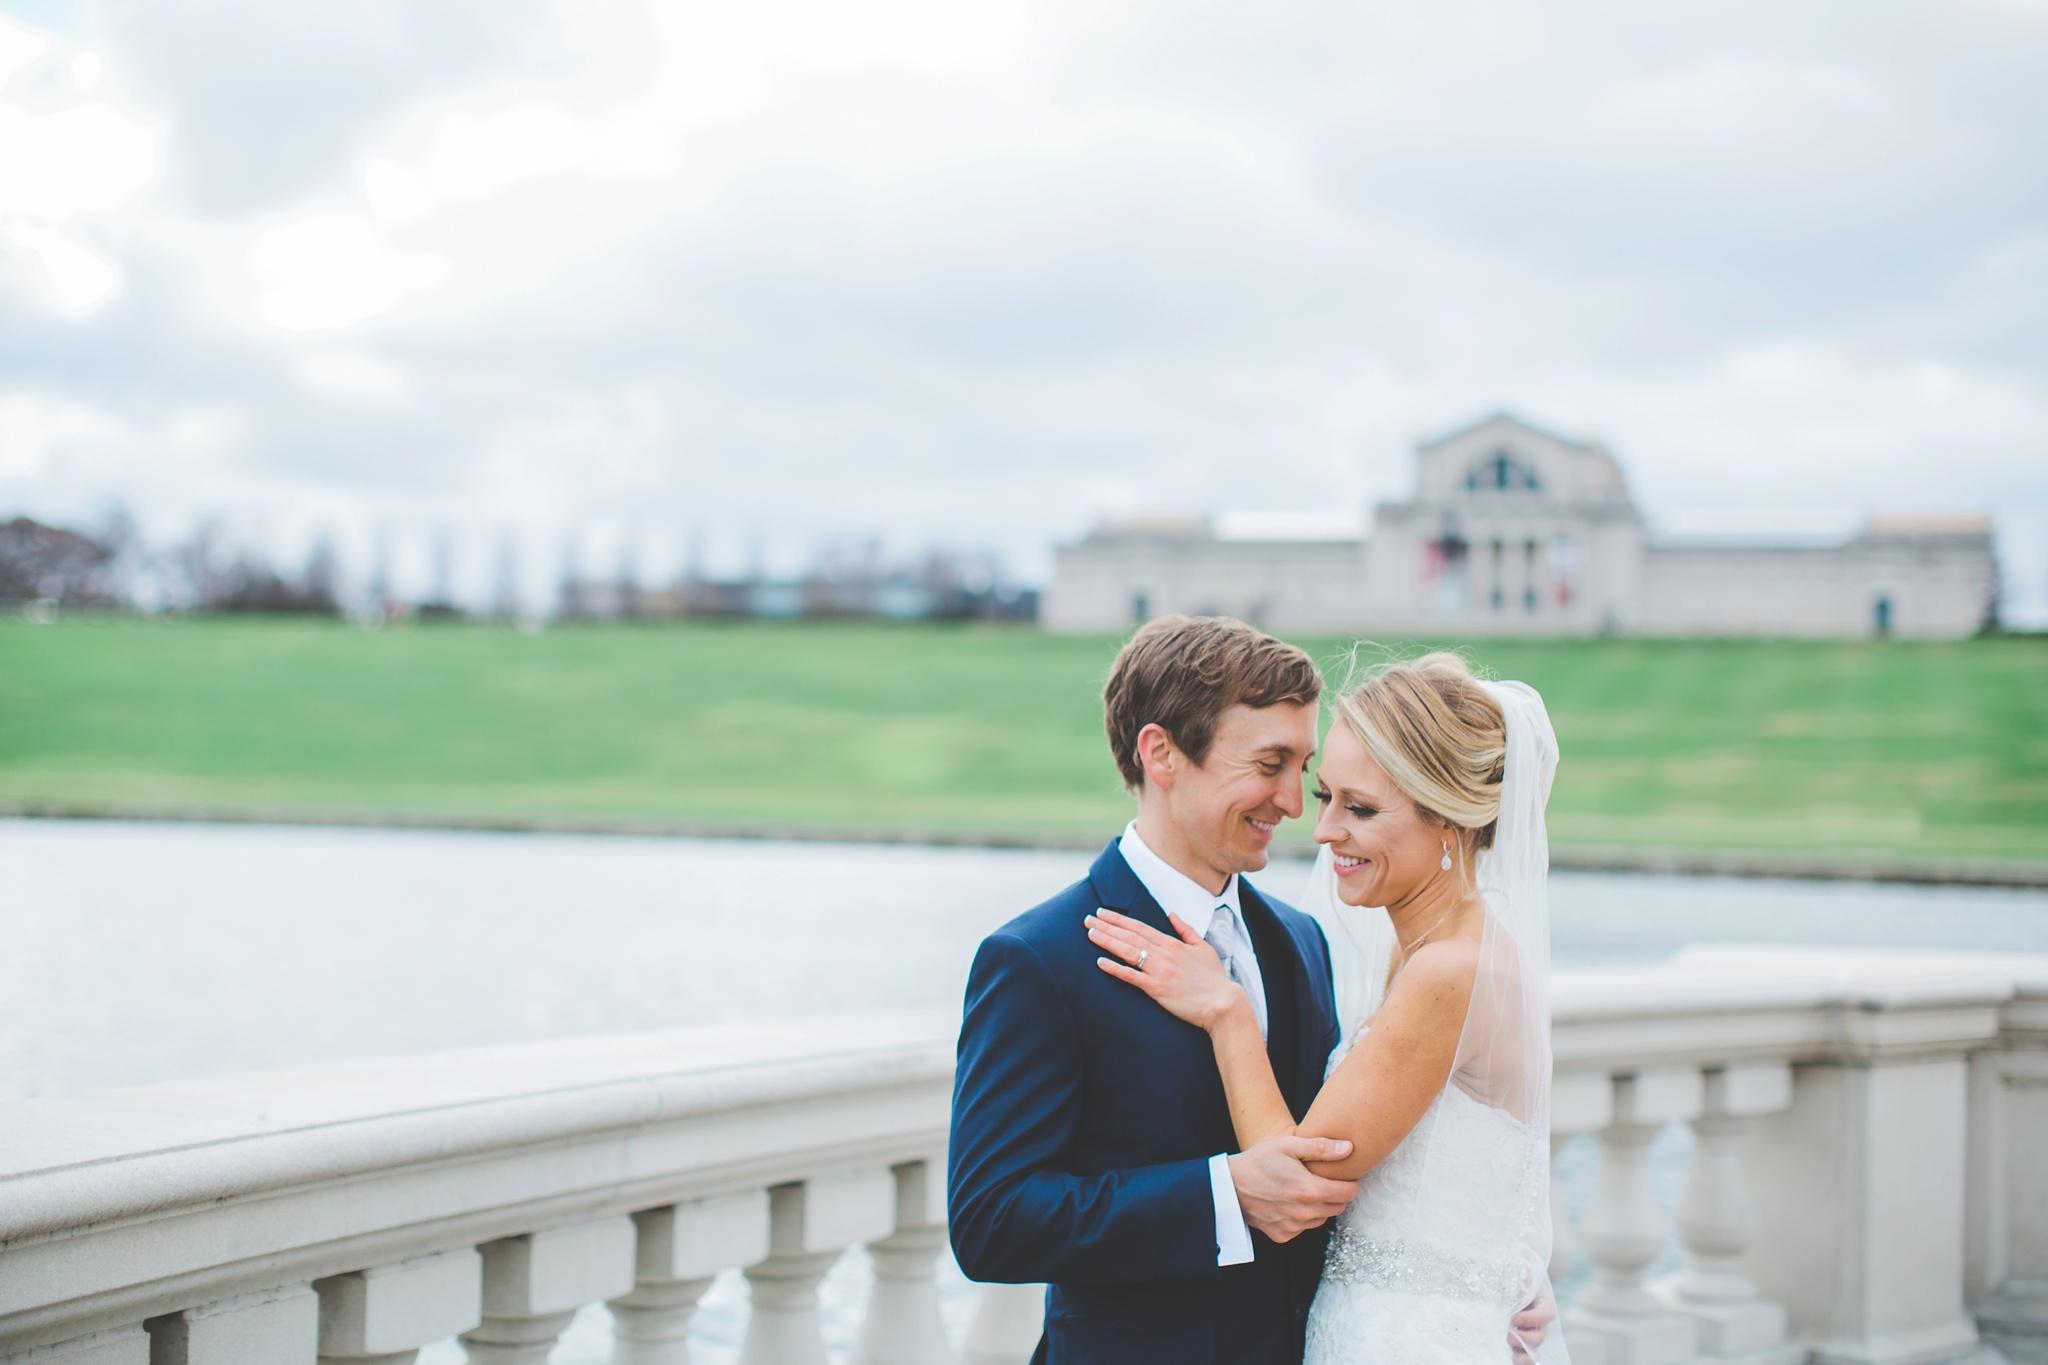 St. Louis Wedding Photographer   Chandler Rose Photography_0028.jpg